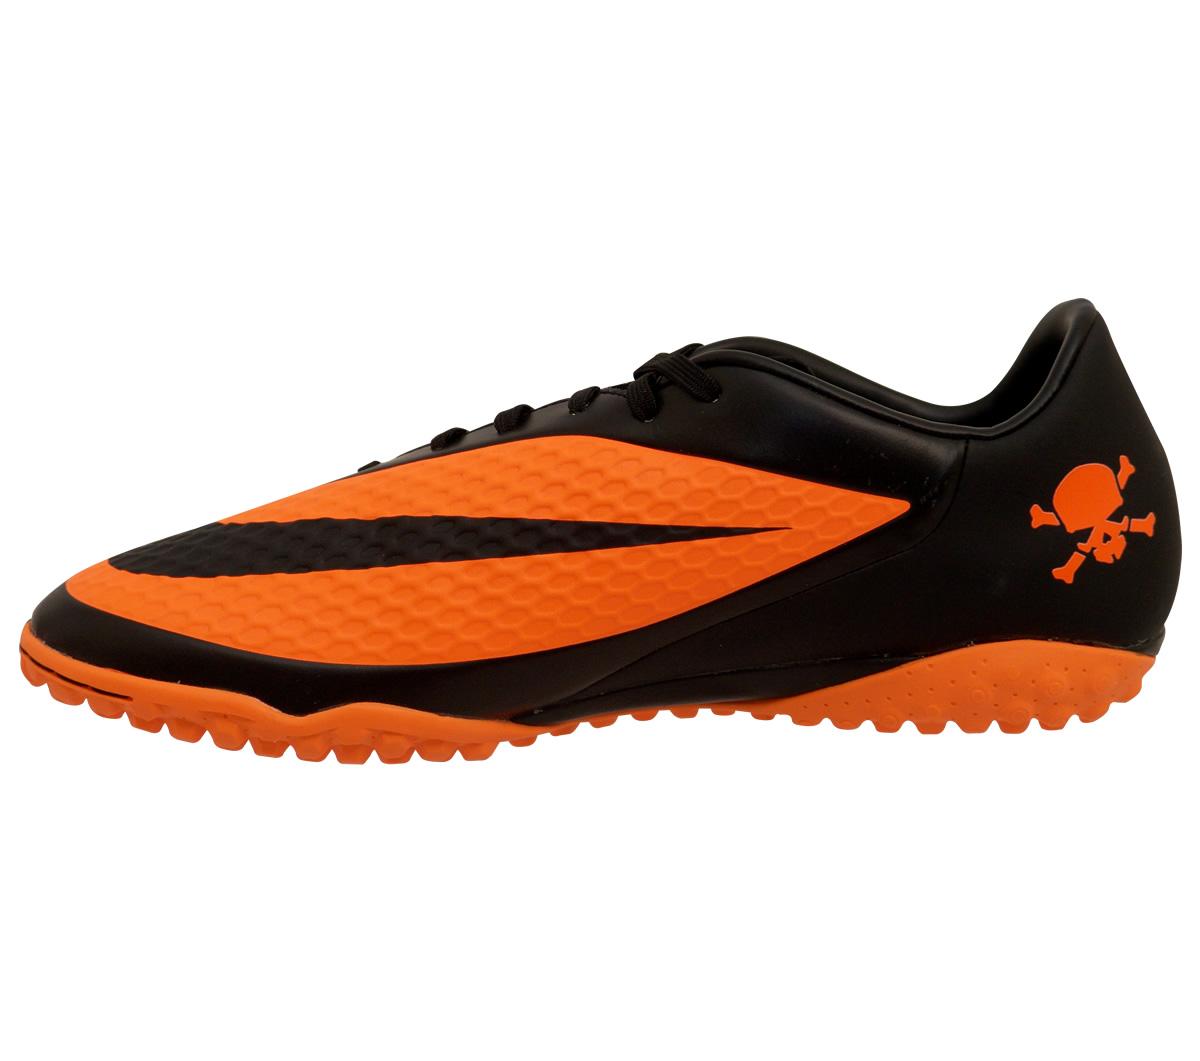 brand new 7e7ce 45854 ... Chuteira Nike Hypervenom Phelon Society Laranja e Preta